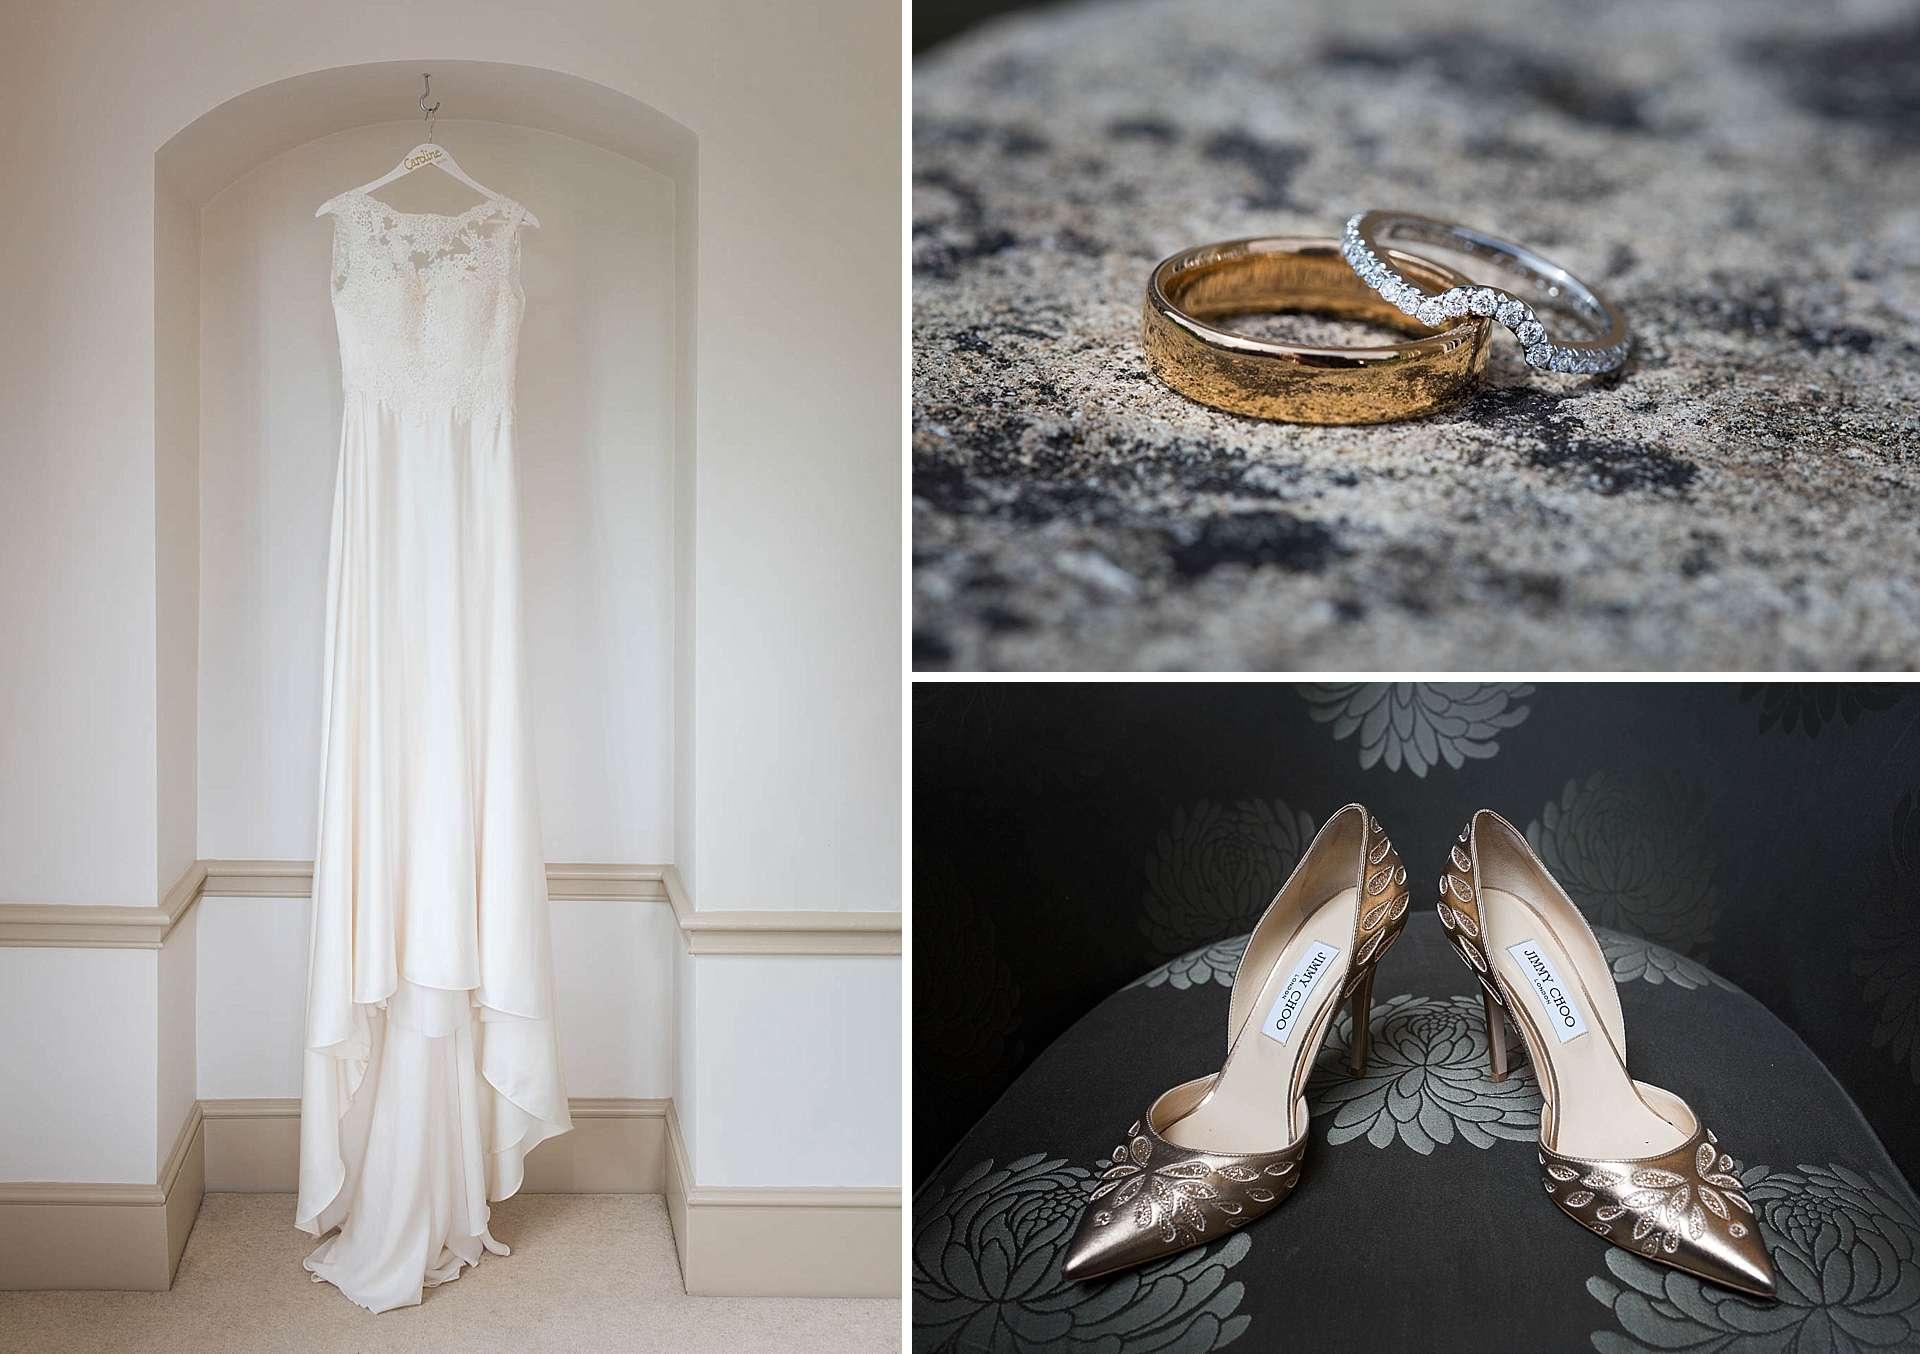 Pronovias wedding dress and Jimmy Choo wedding shoes